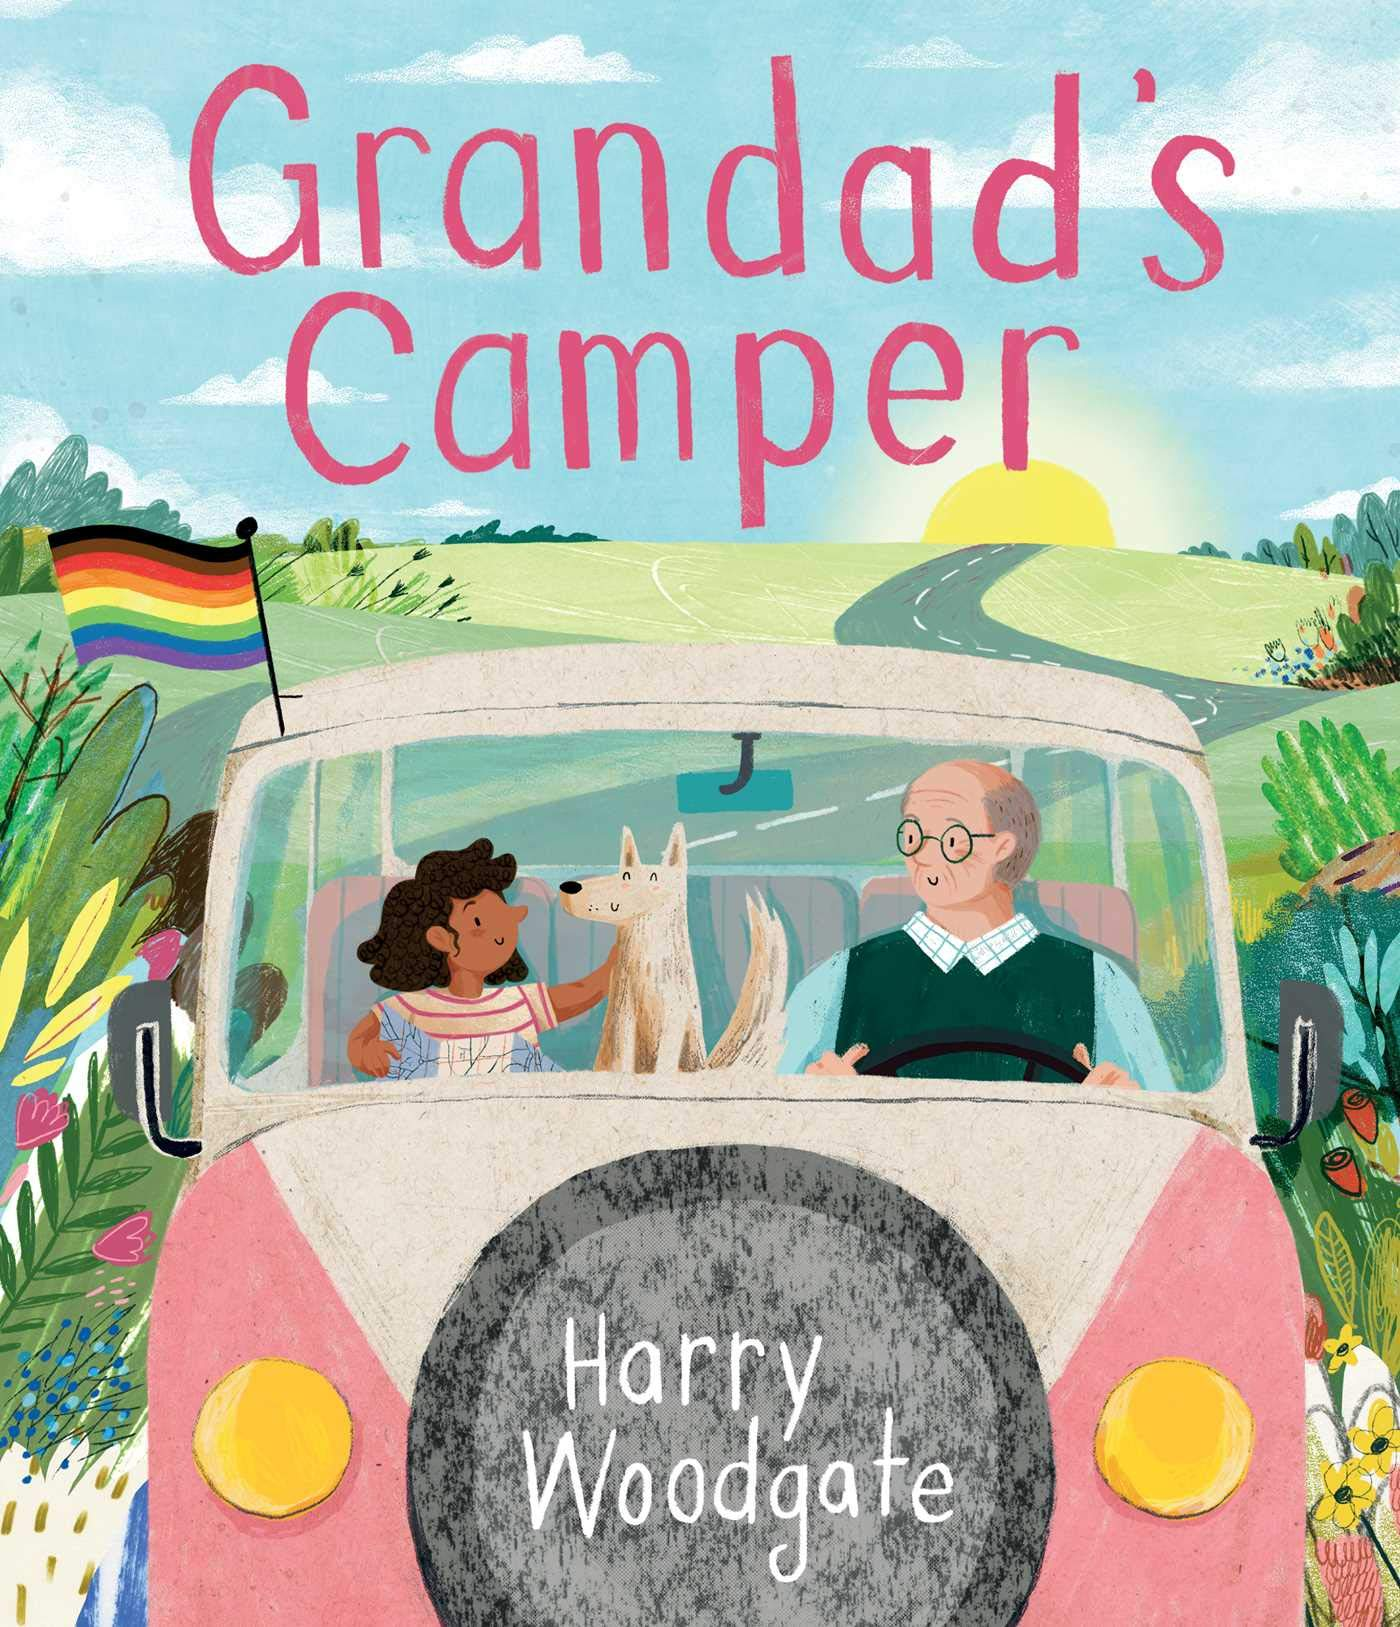 Grandad's Camper: Woodgate, Harry: 9781499811933: Amazon.com: Books